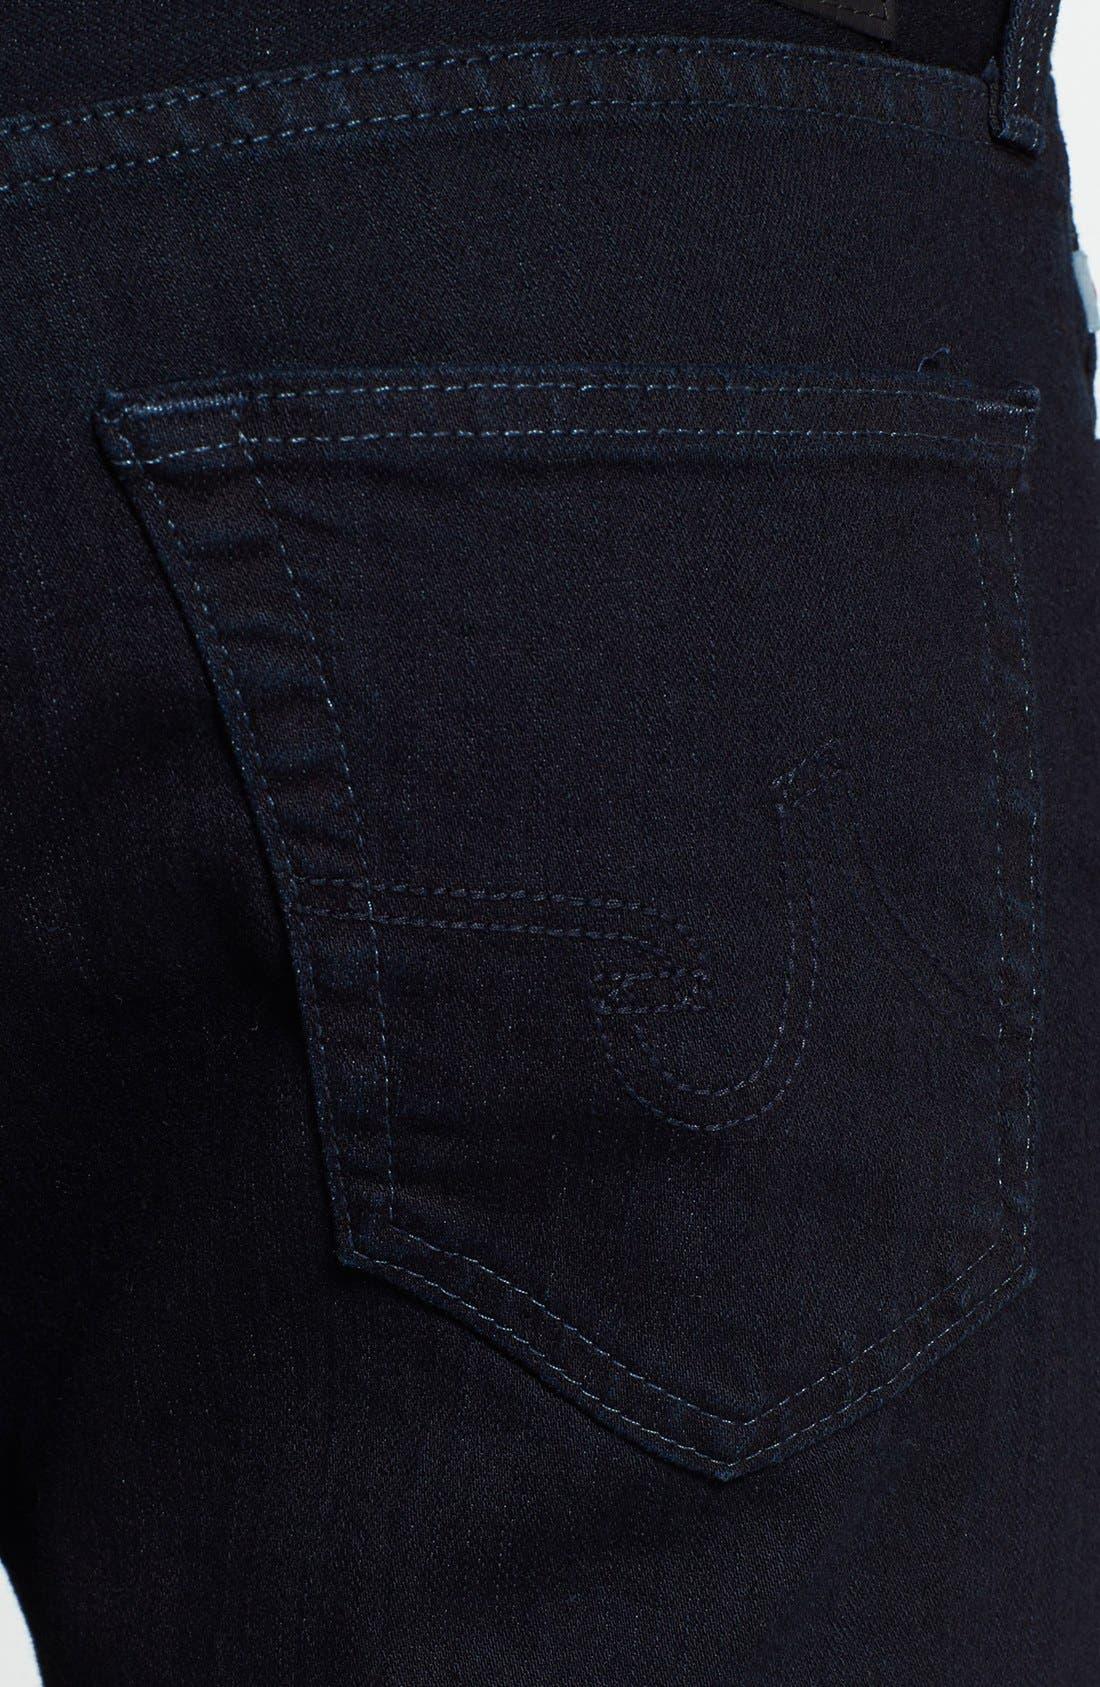 'Graduate' Tailored Fit Straight Leg Jeans,                             Alternate thumbnail 3, color,                             409